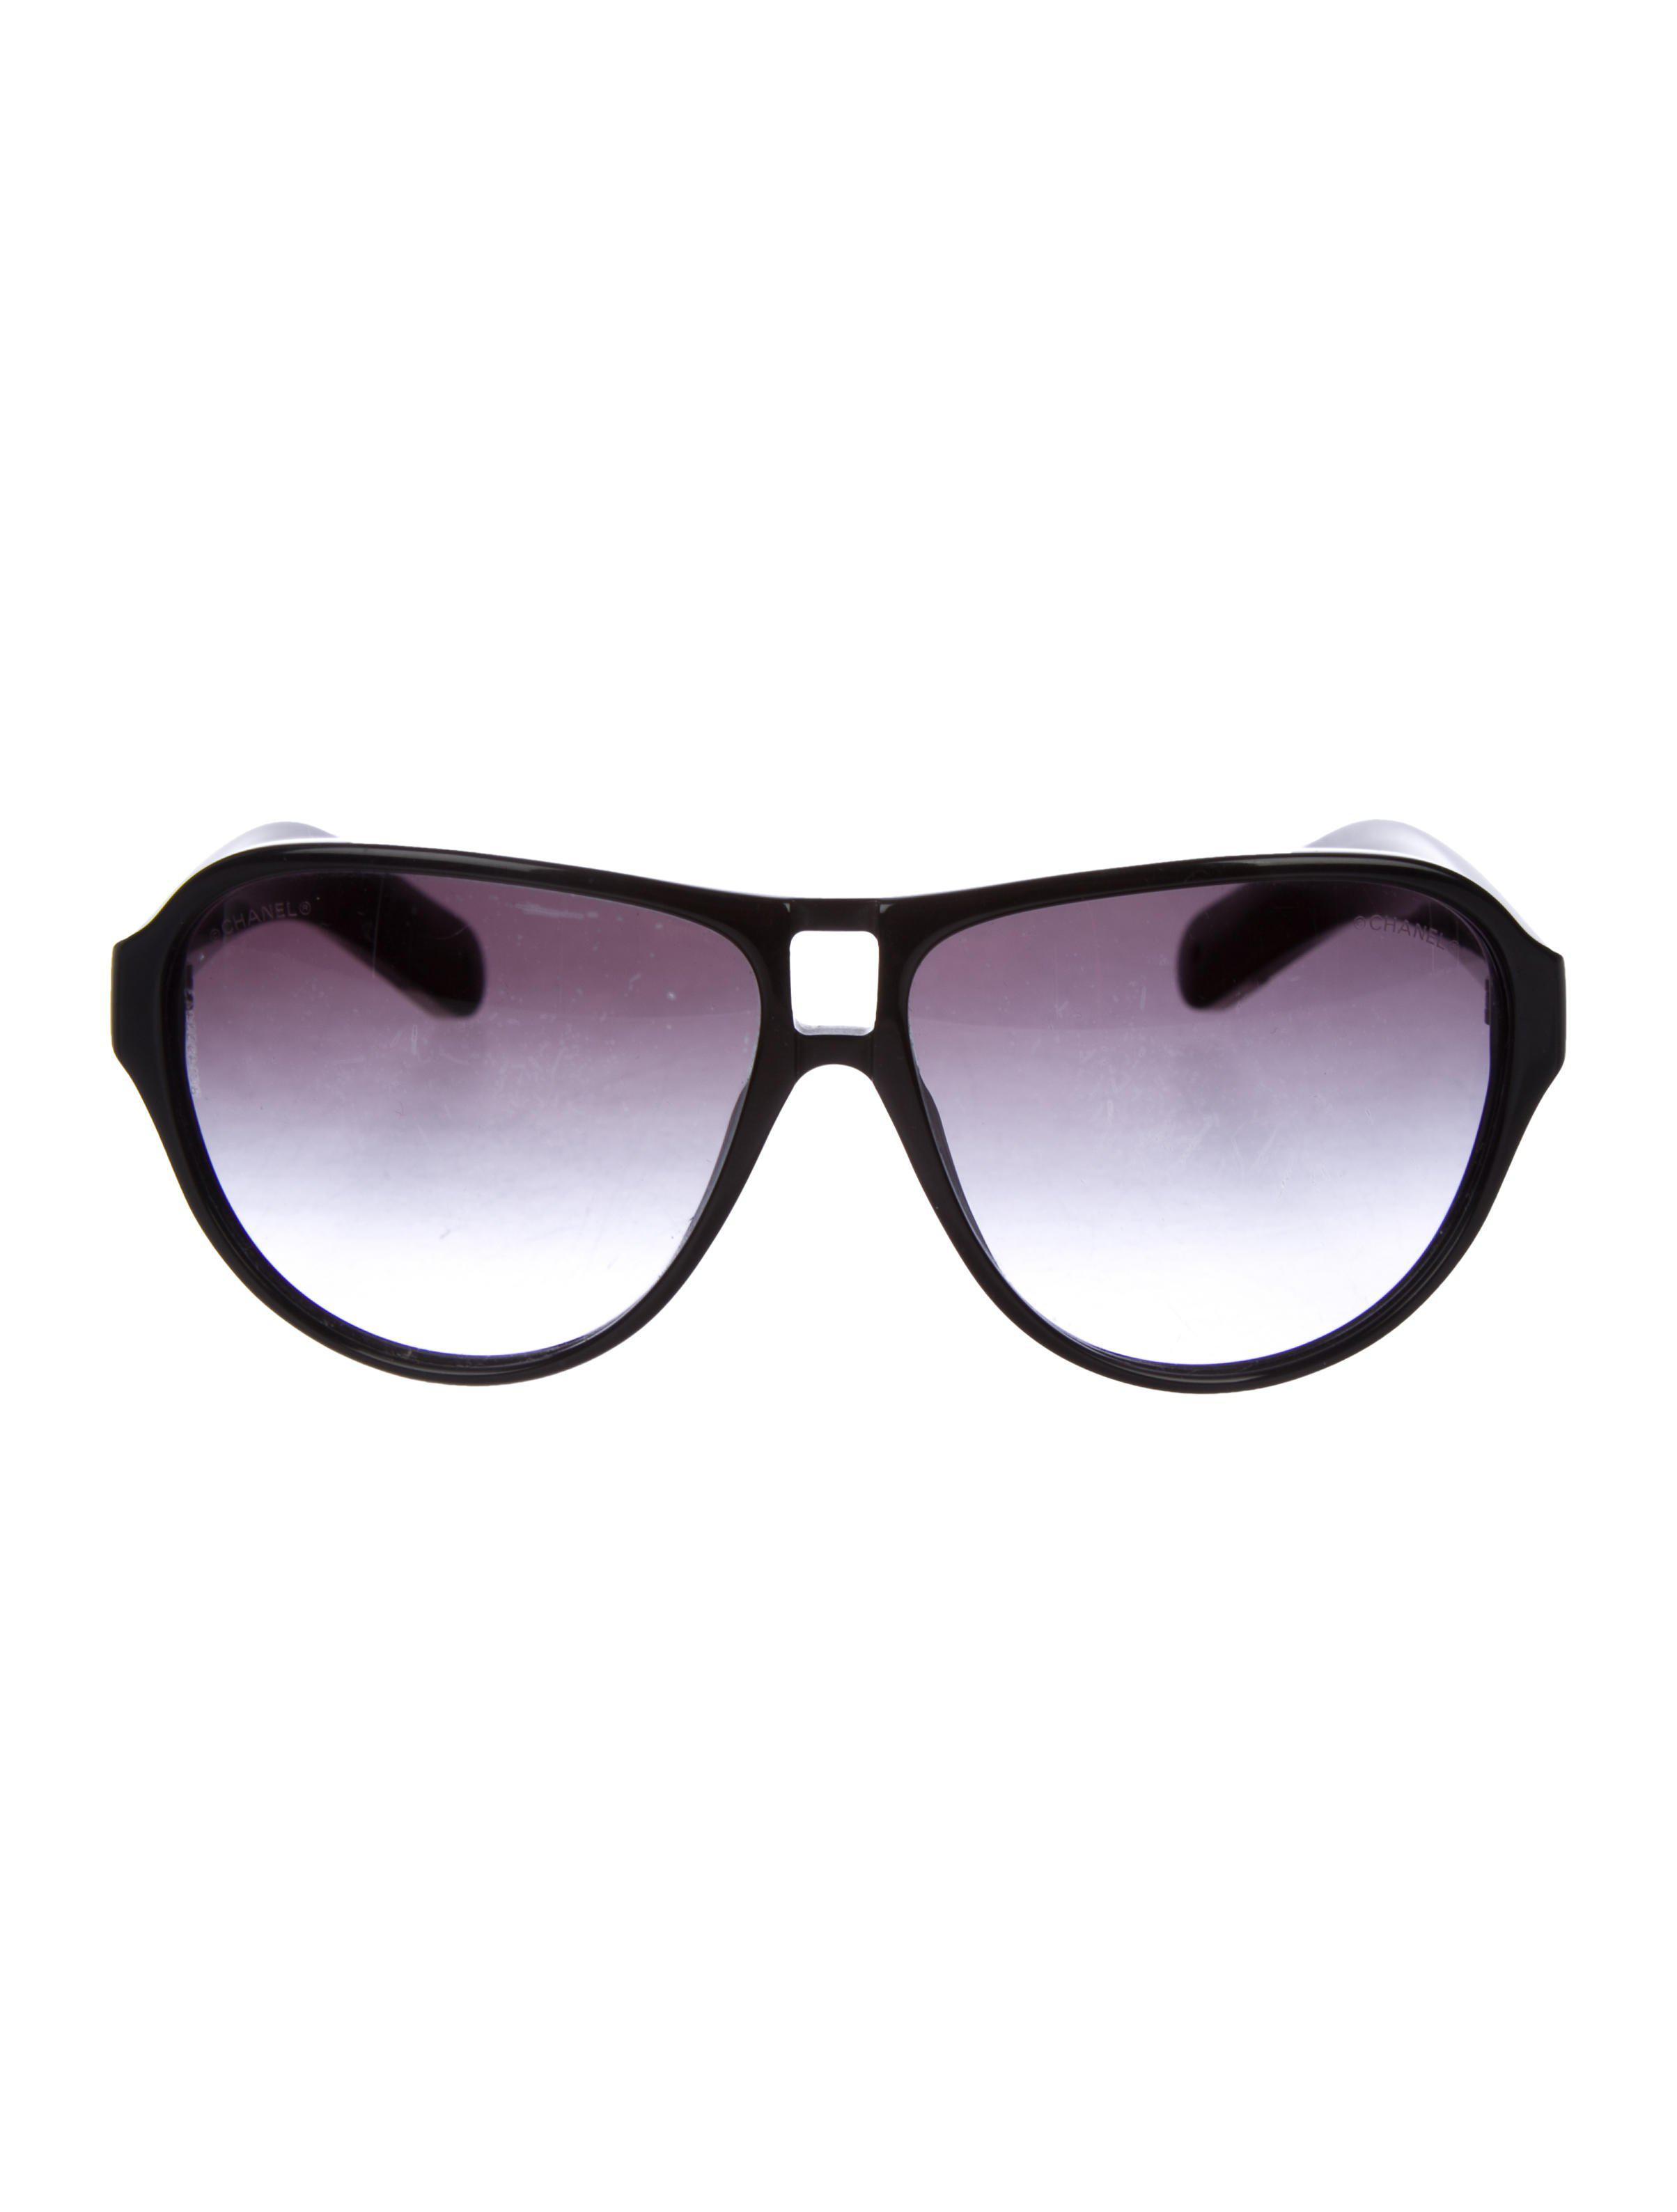 857c2fe7d69 Chanel - Metallic Cc Aviator Sunglasses Black - Lyst. View Fullscreen